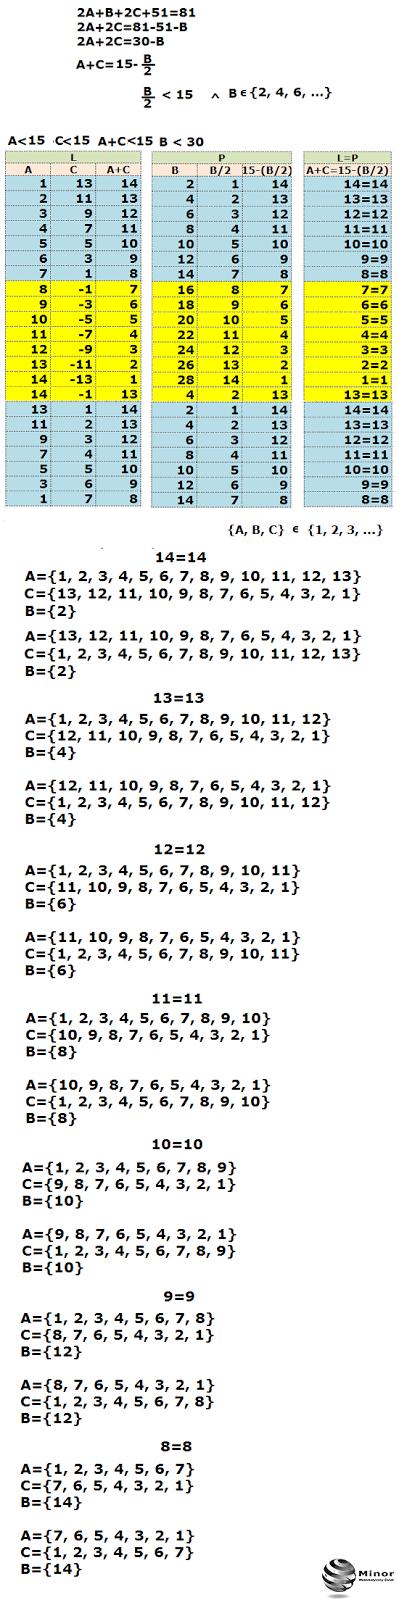 Blog matematyczny minor matematyka diagram venna w kwadracie post nr 192 ccuart Choice Image